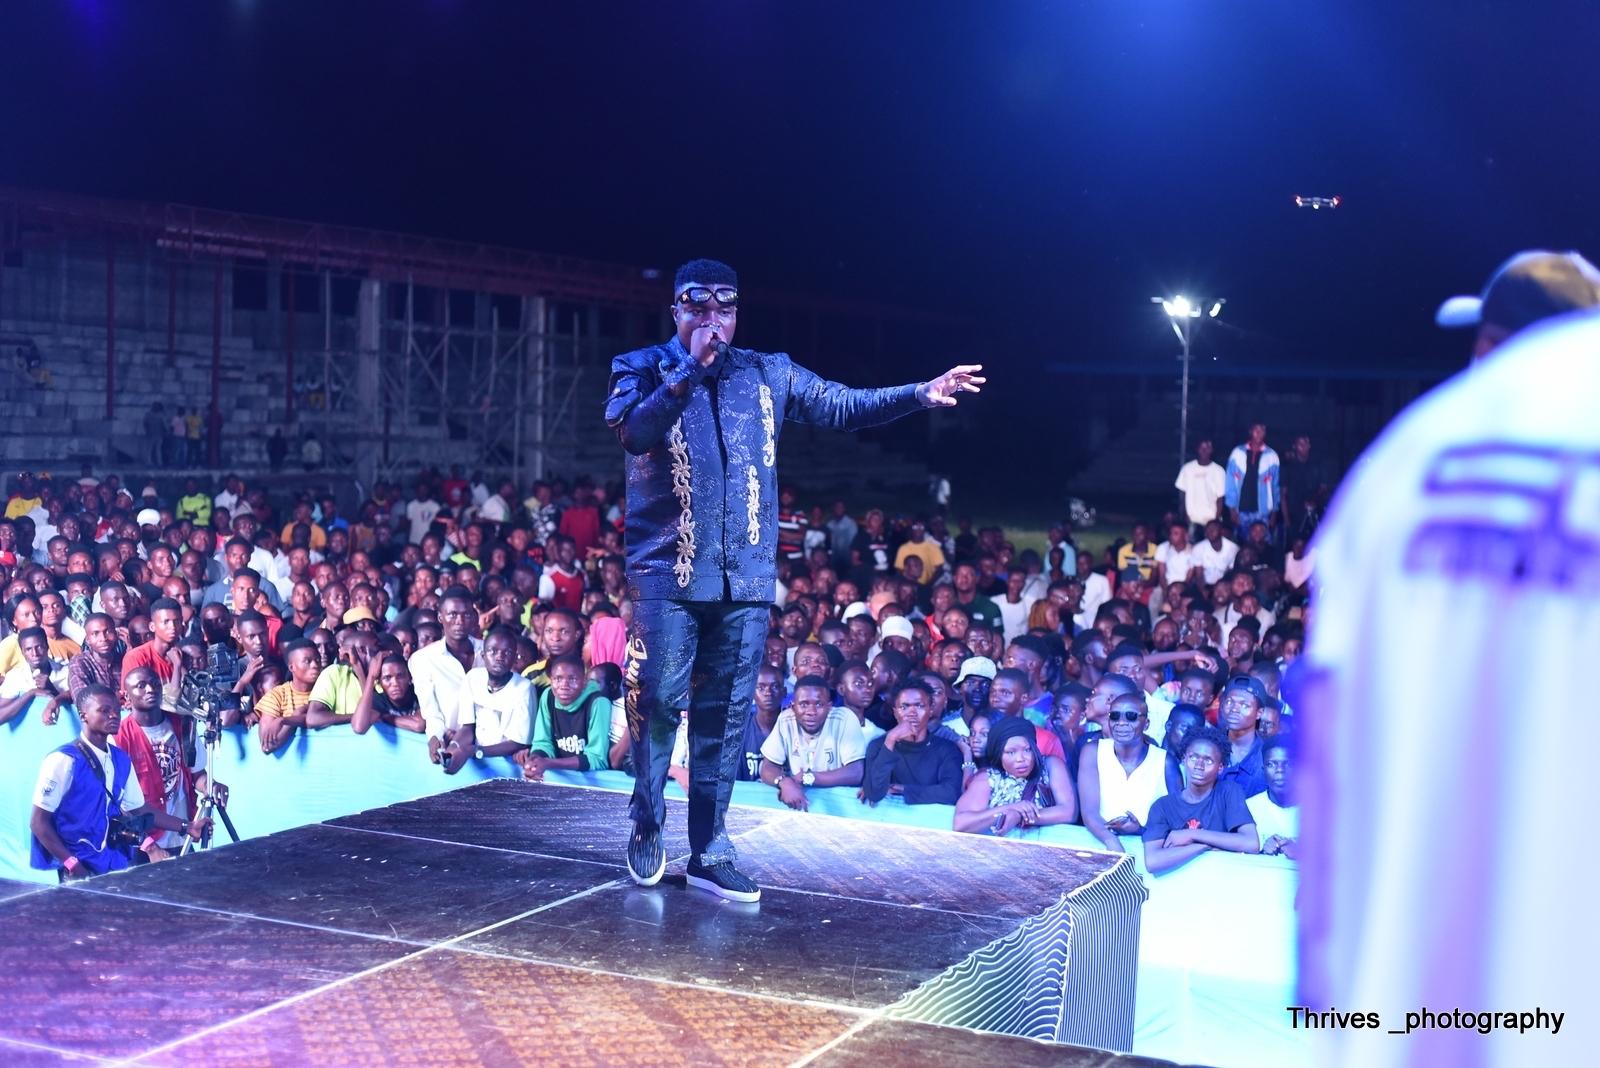 Jumabee performing at his Concert held in Lokoja, Kogi State